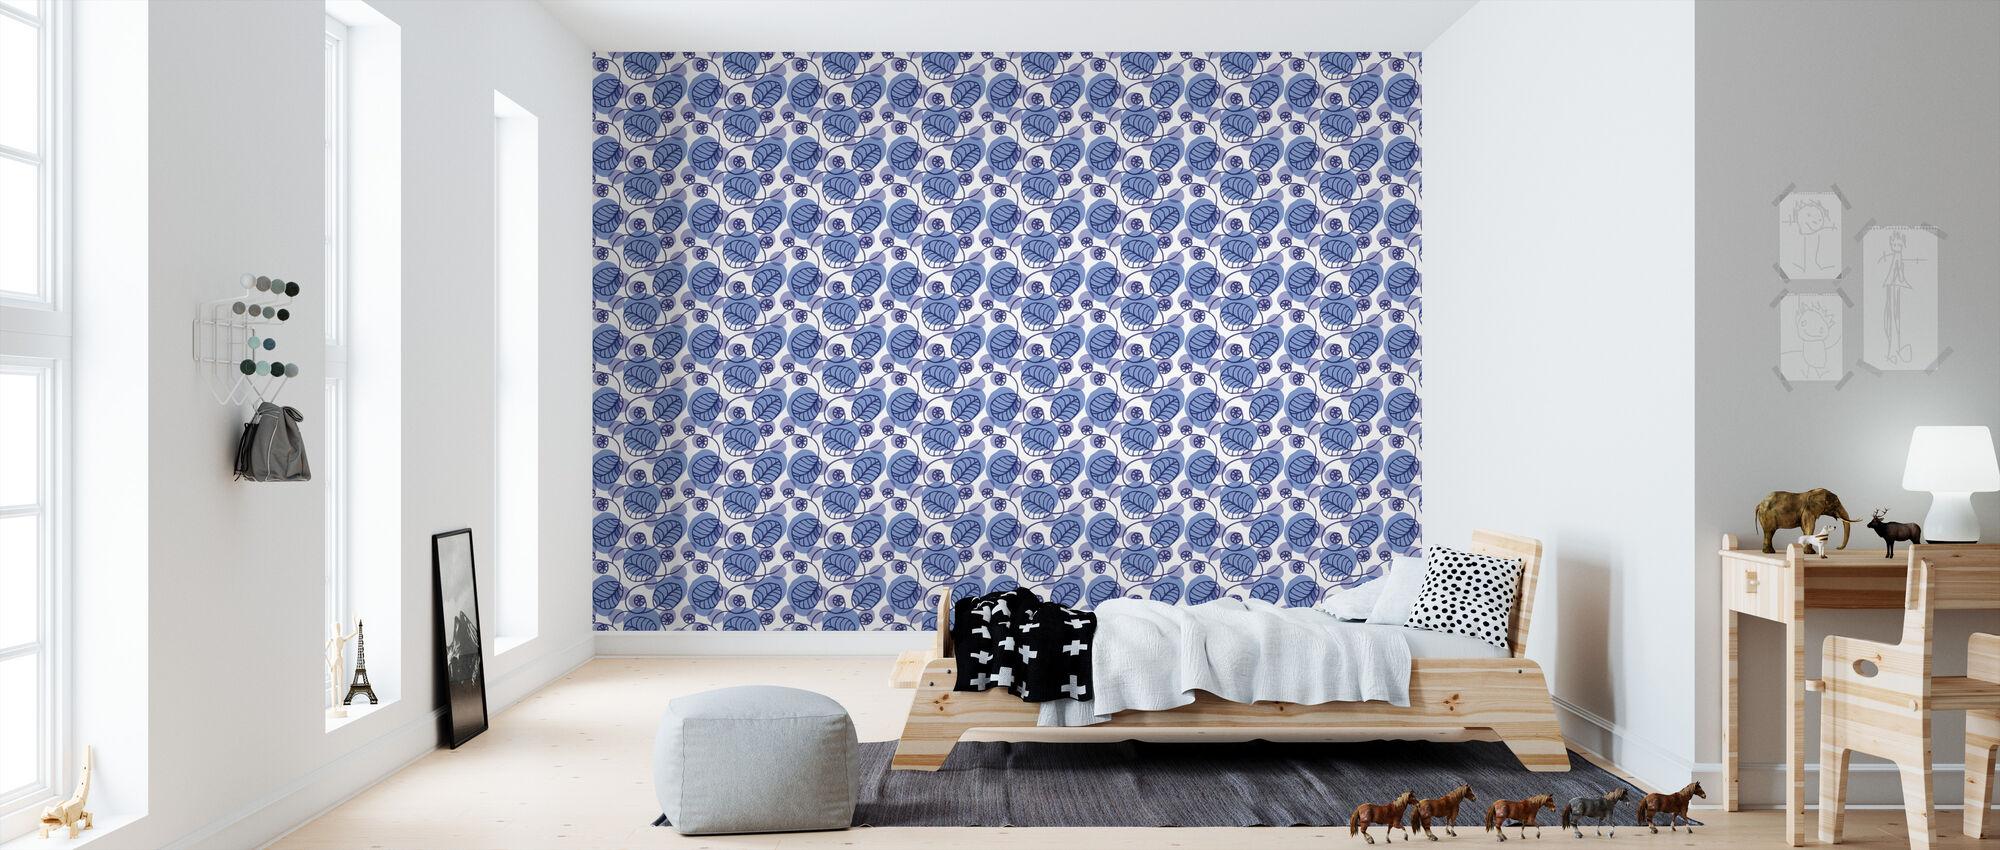 flora blue stilvolle tapete h chster qualit t mit schneller lieferung photowall. Black Bedroom Furniture Sets. Home Design Ideas